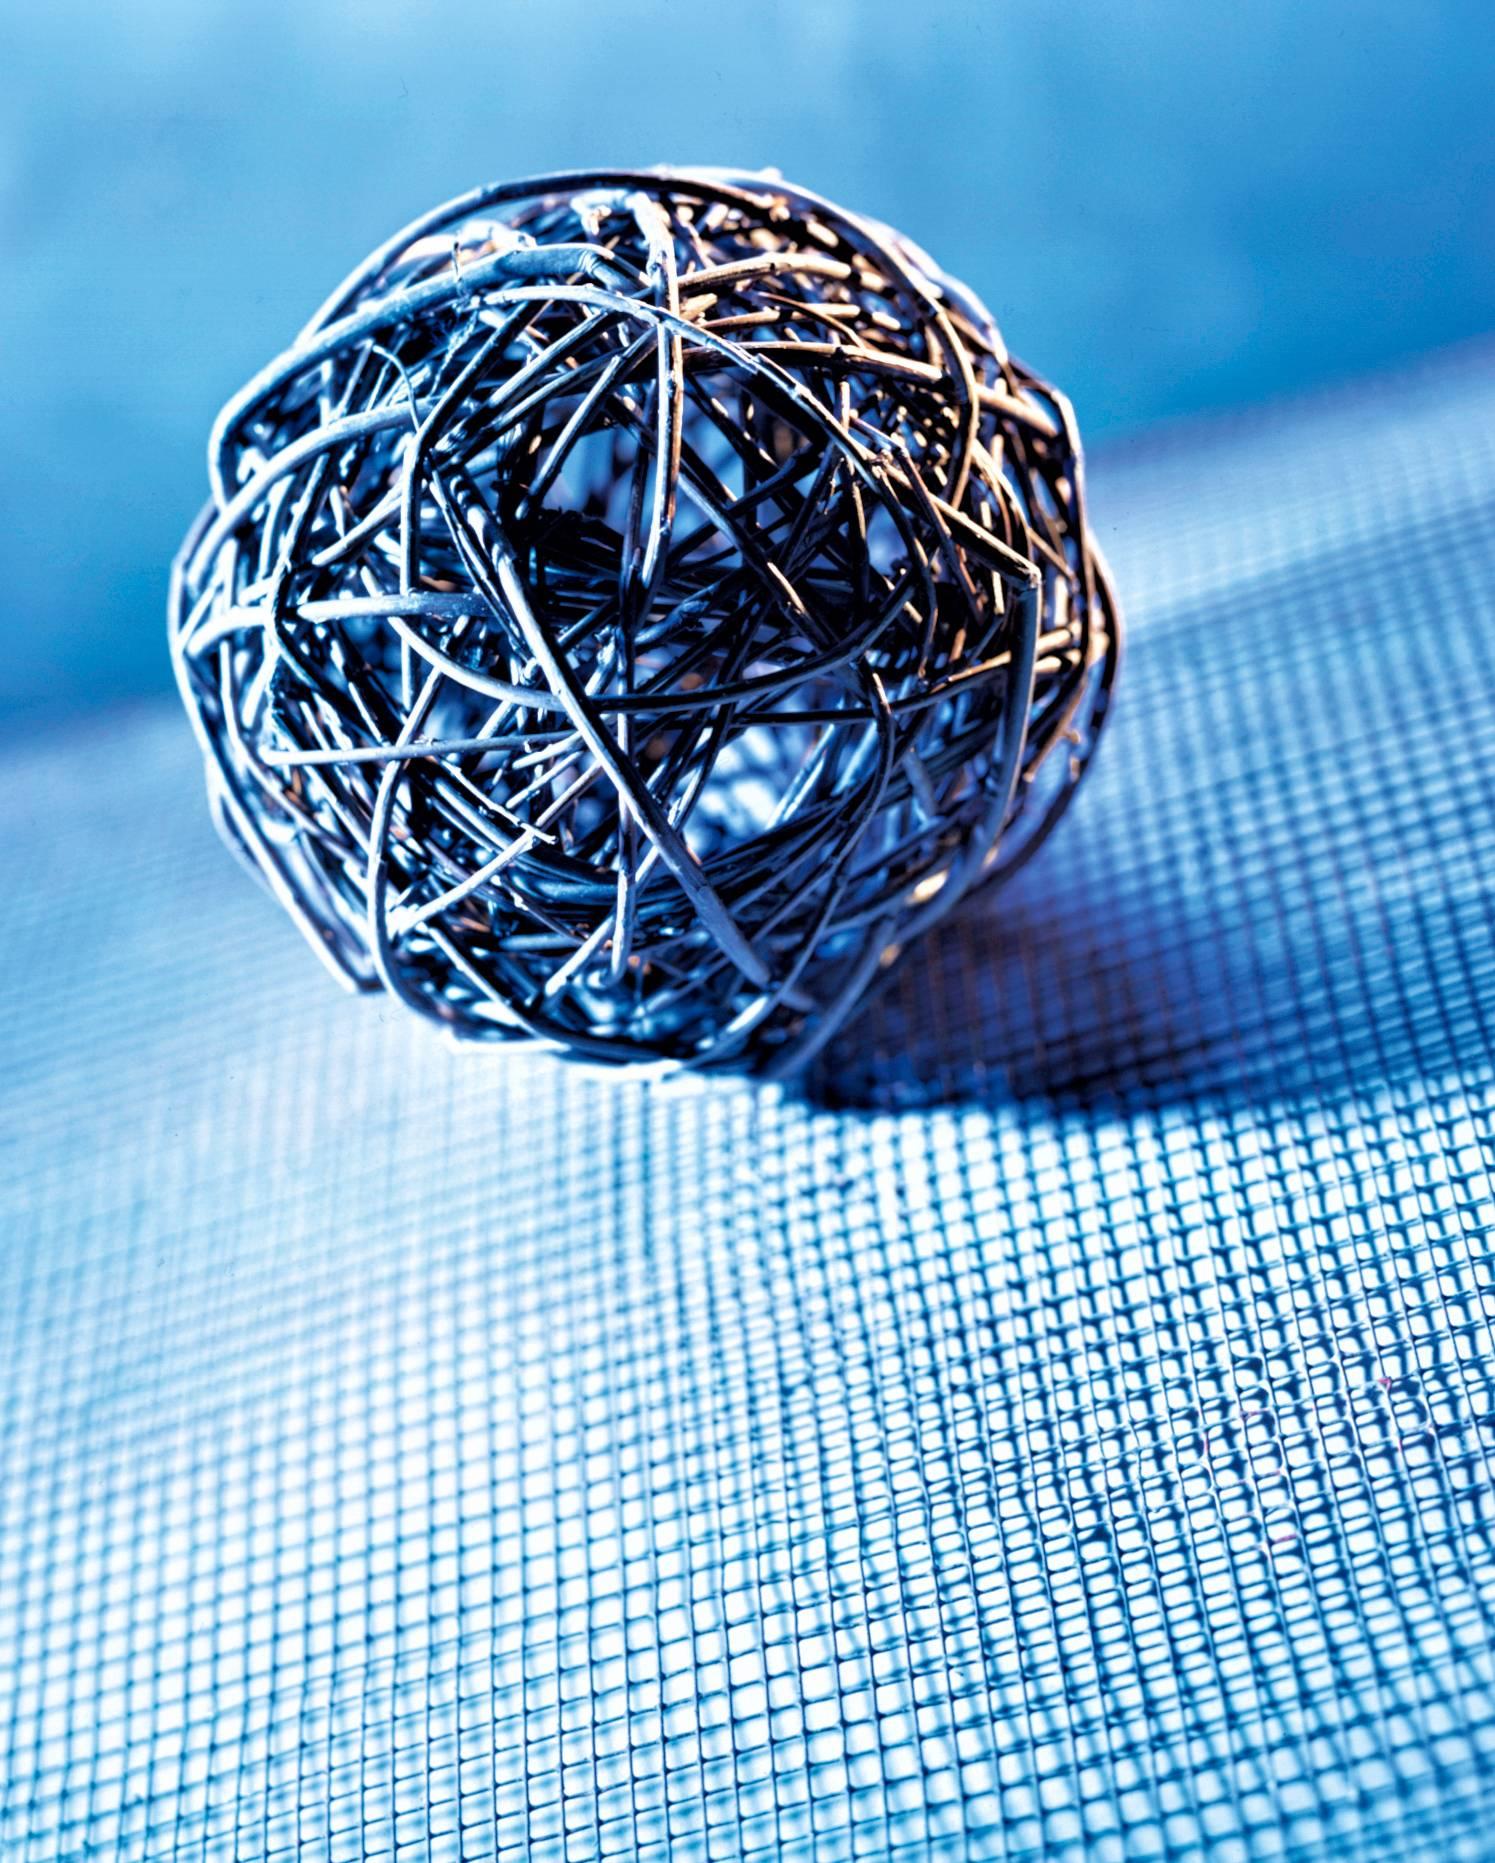 Dung-Ball-copy.jpg